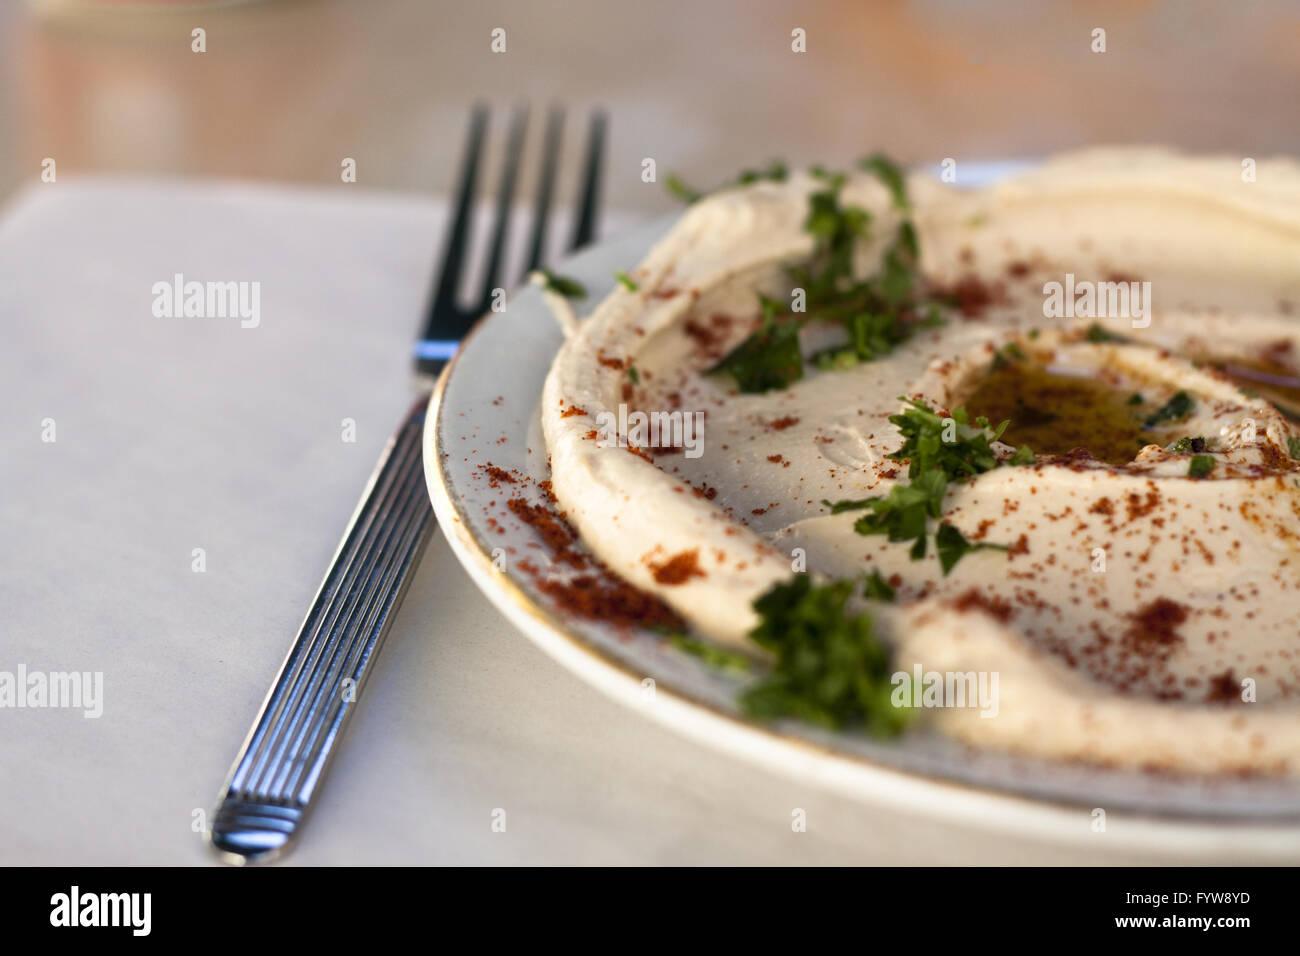 humus - Stock Image